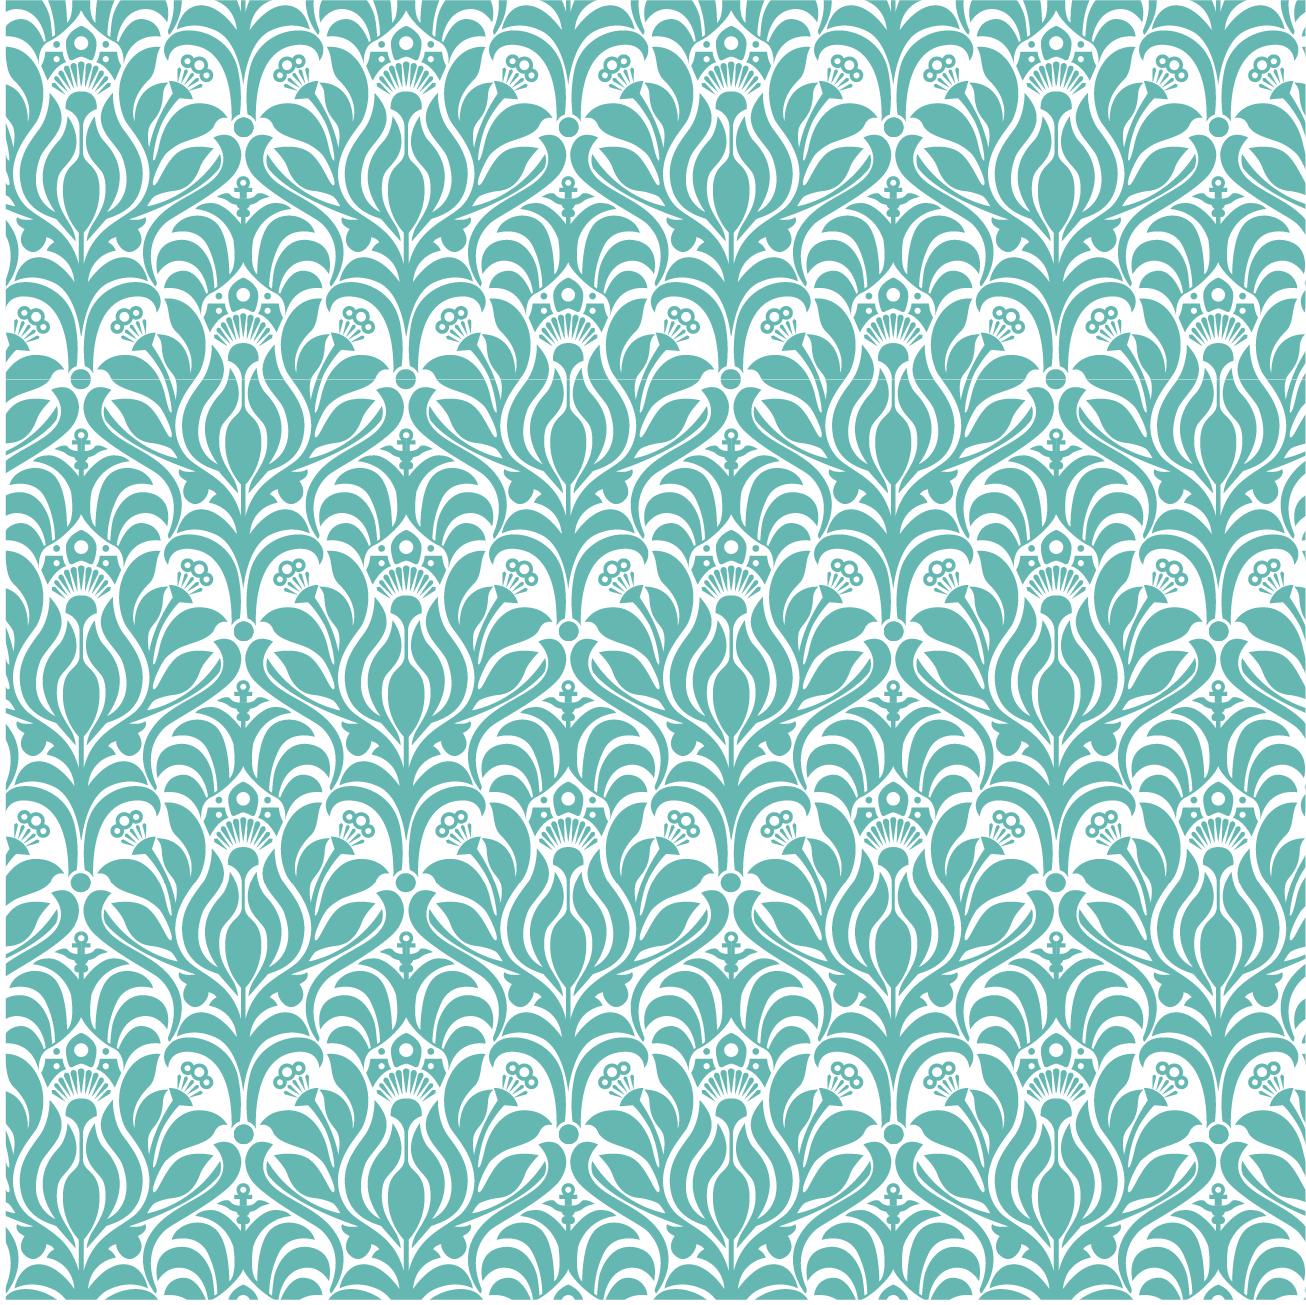 melos_logo_pattern-16.jpg